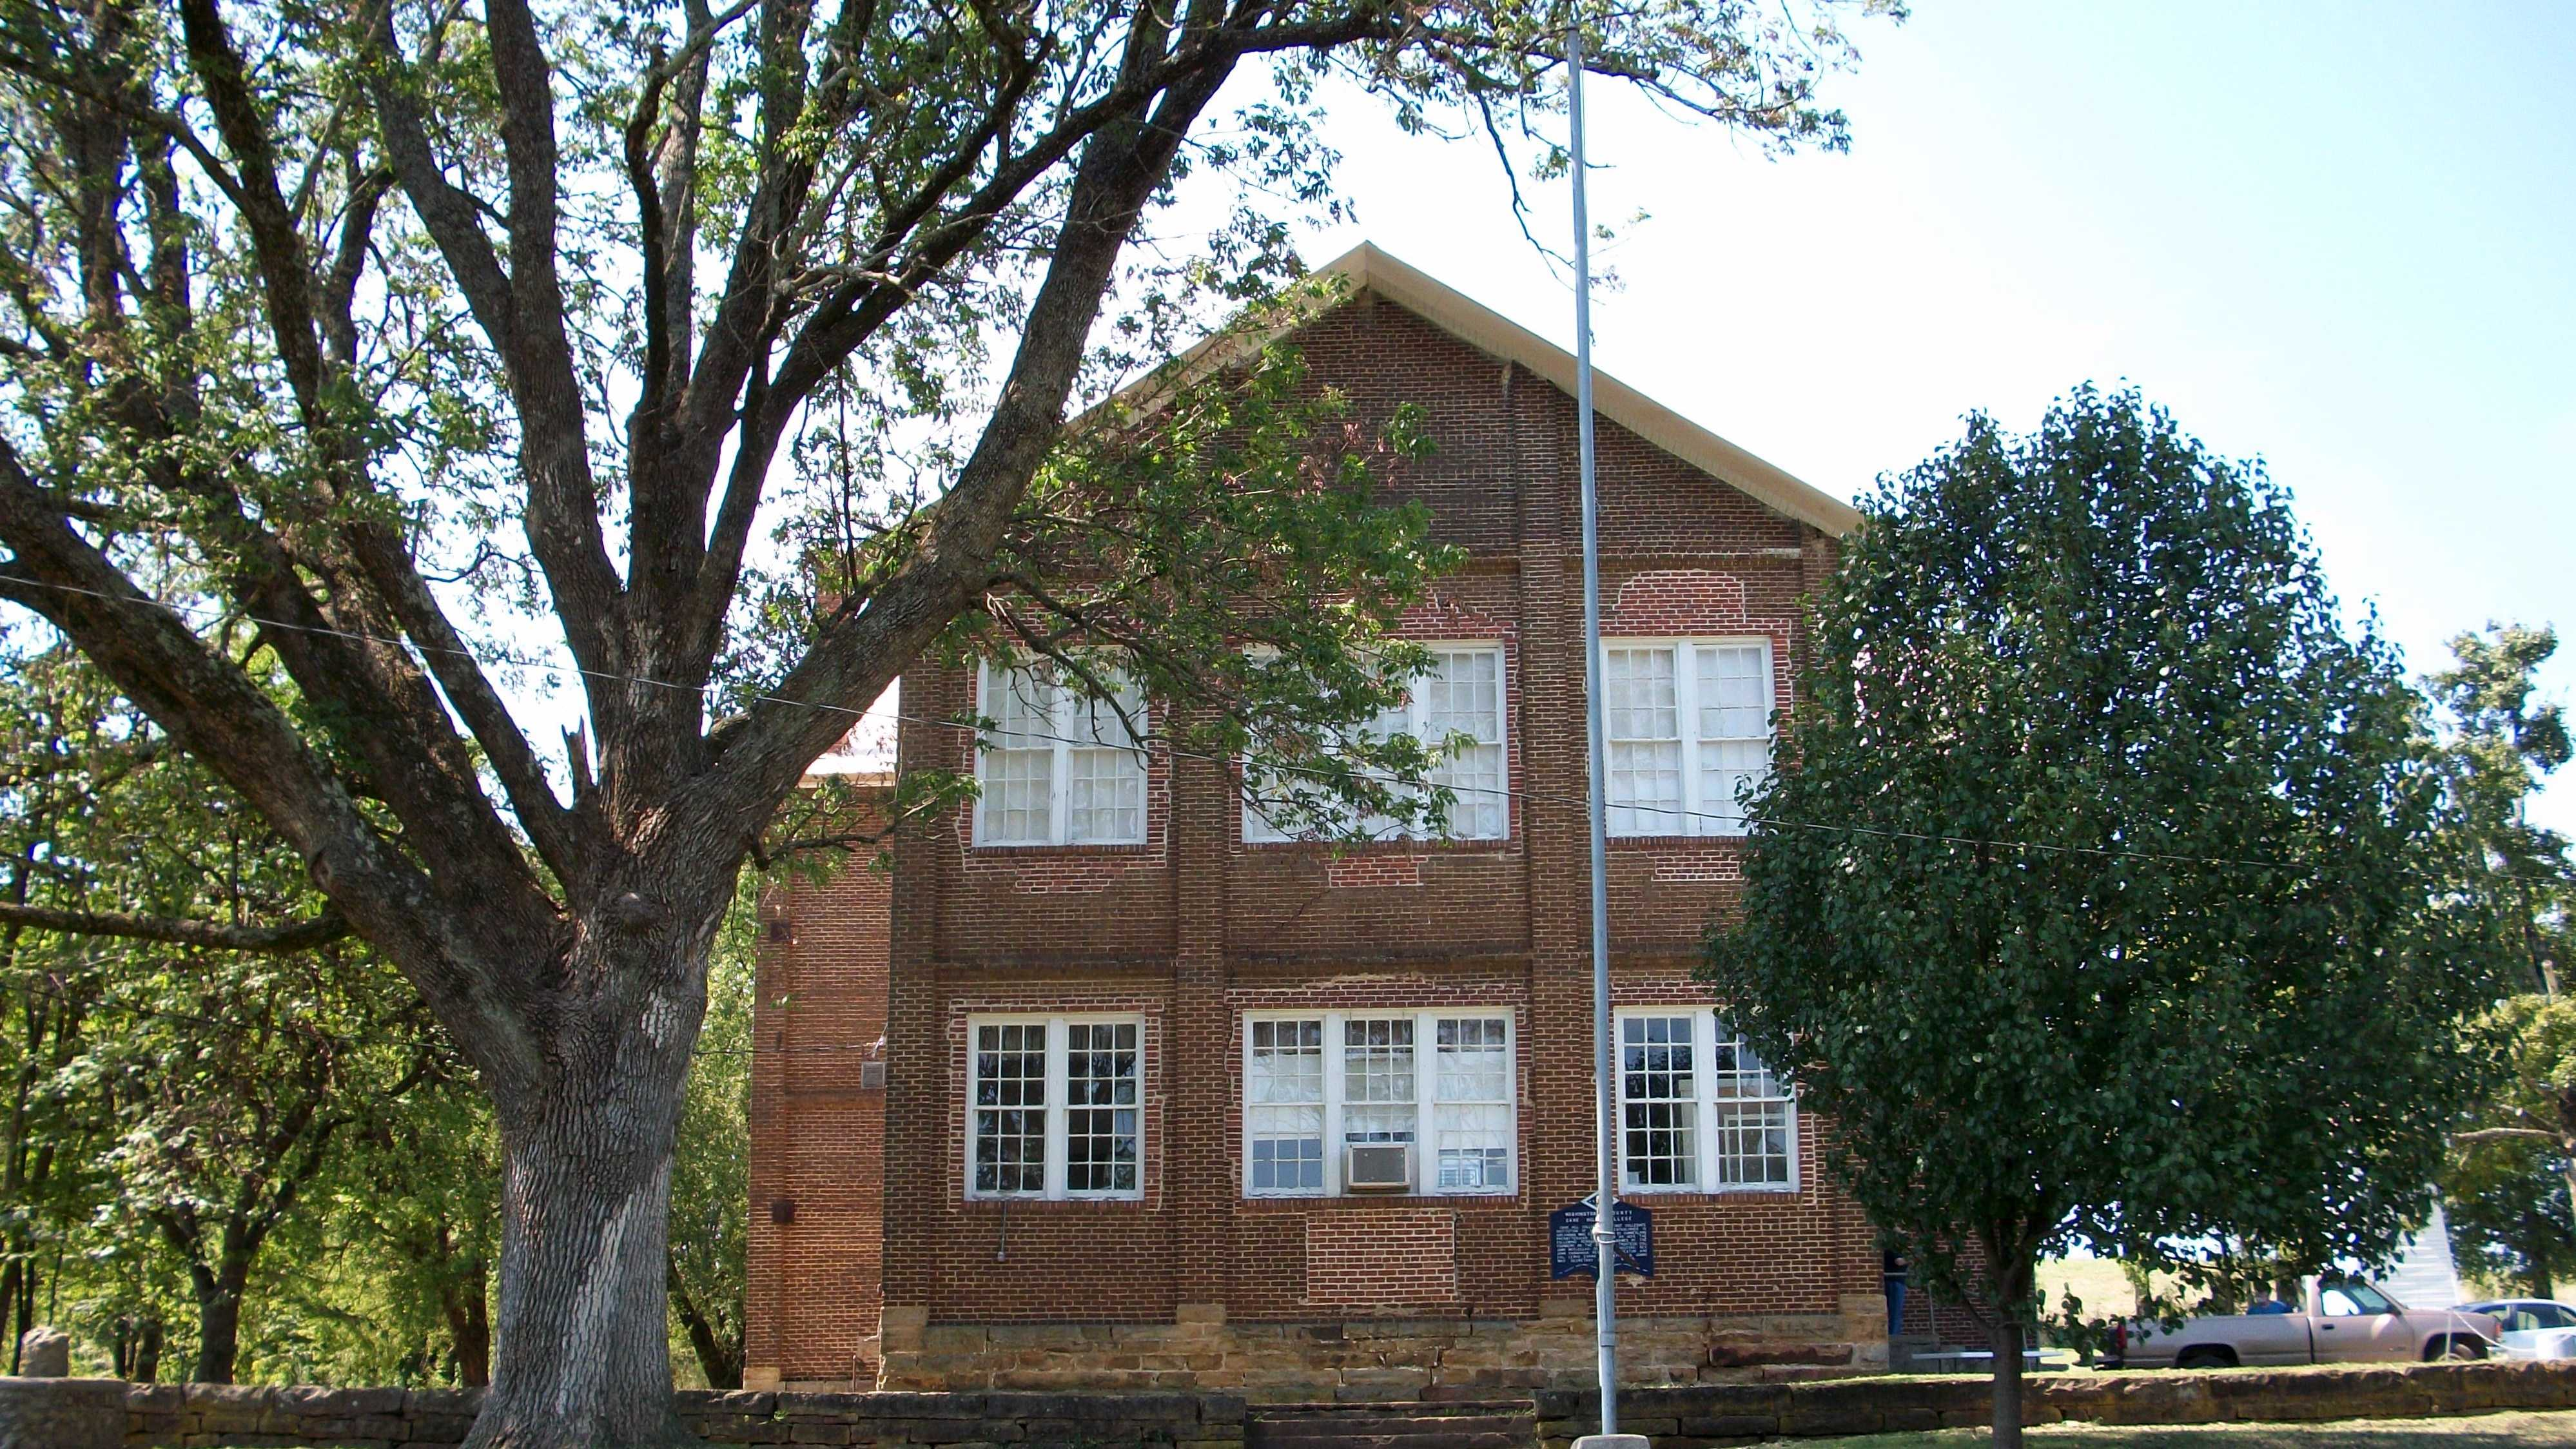 Cane Hill College